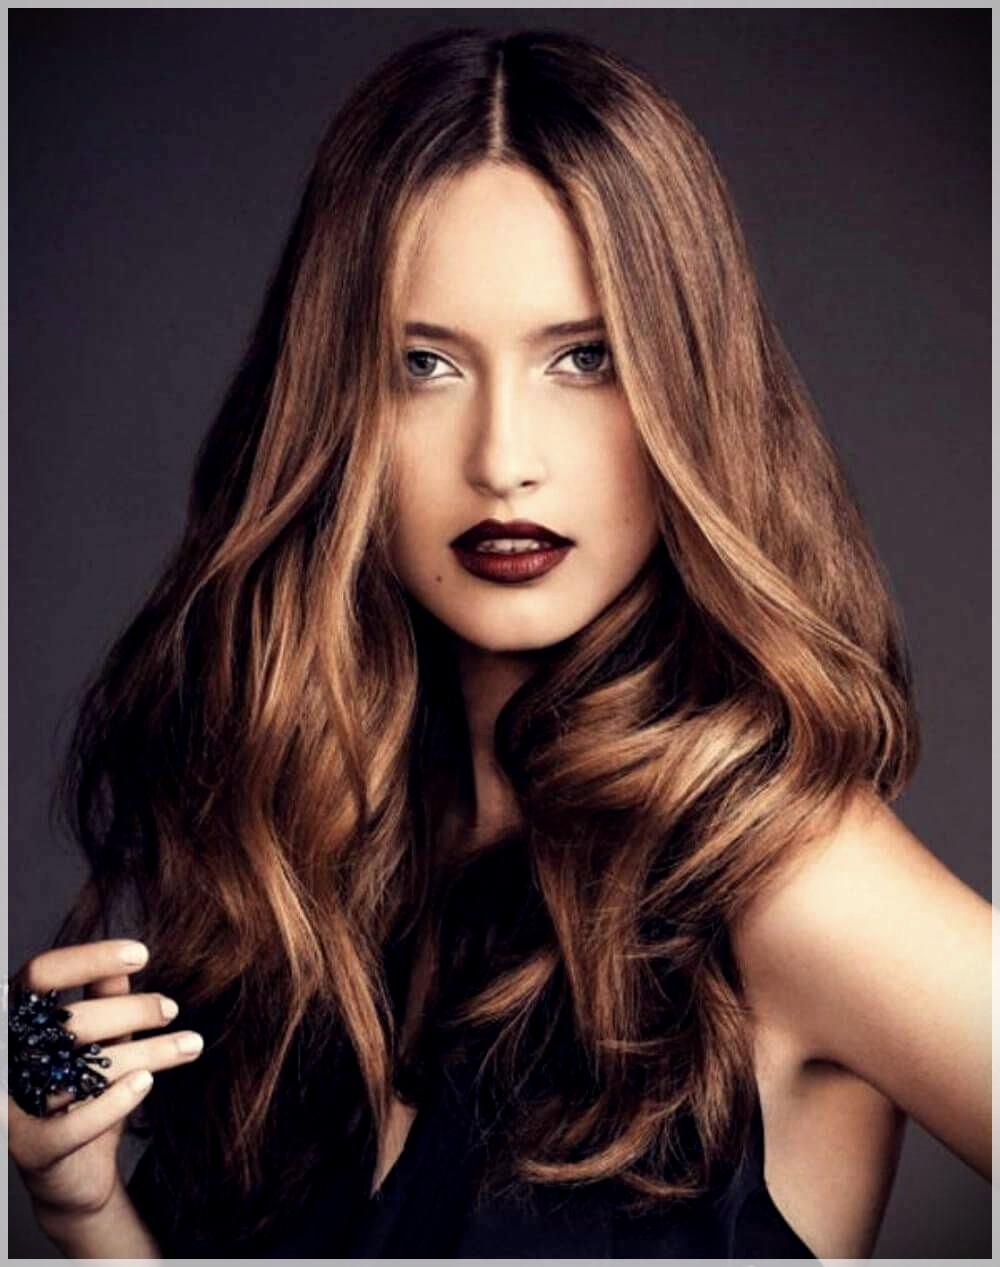 caramel brown hair color ideas 9 - Rocking caramel brown hair color